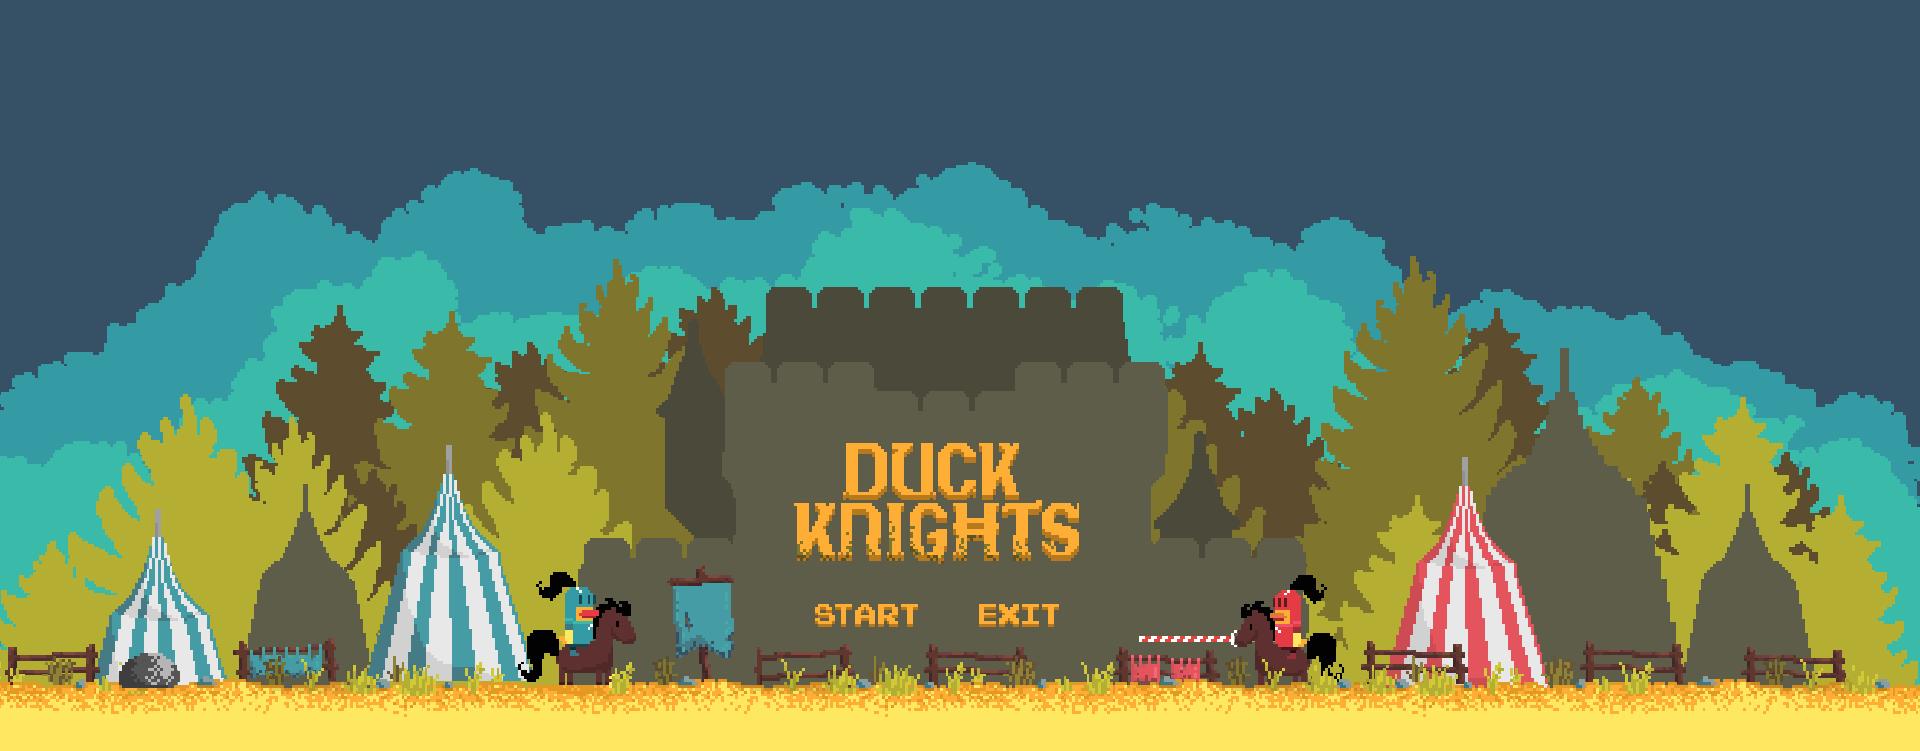 Duck Knights - Knights Tournament